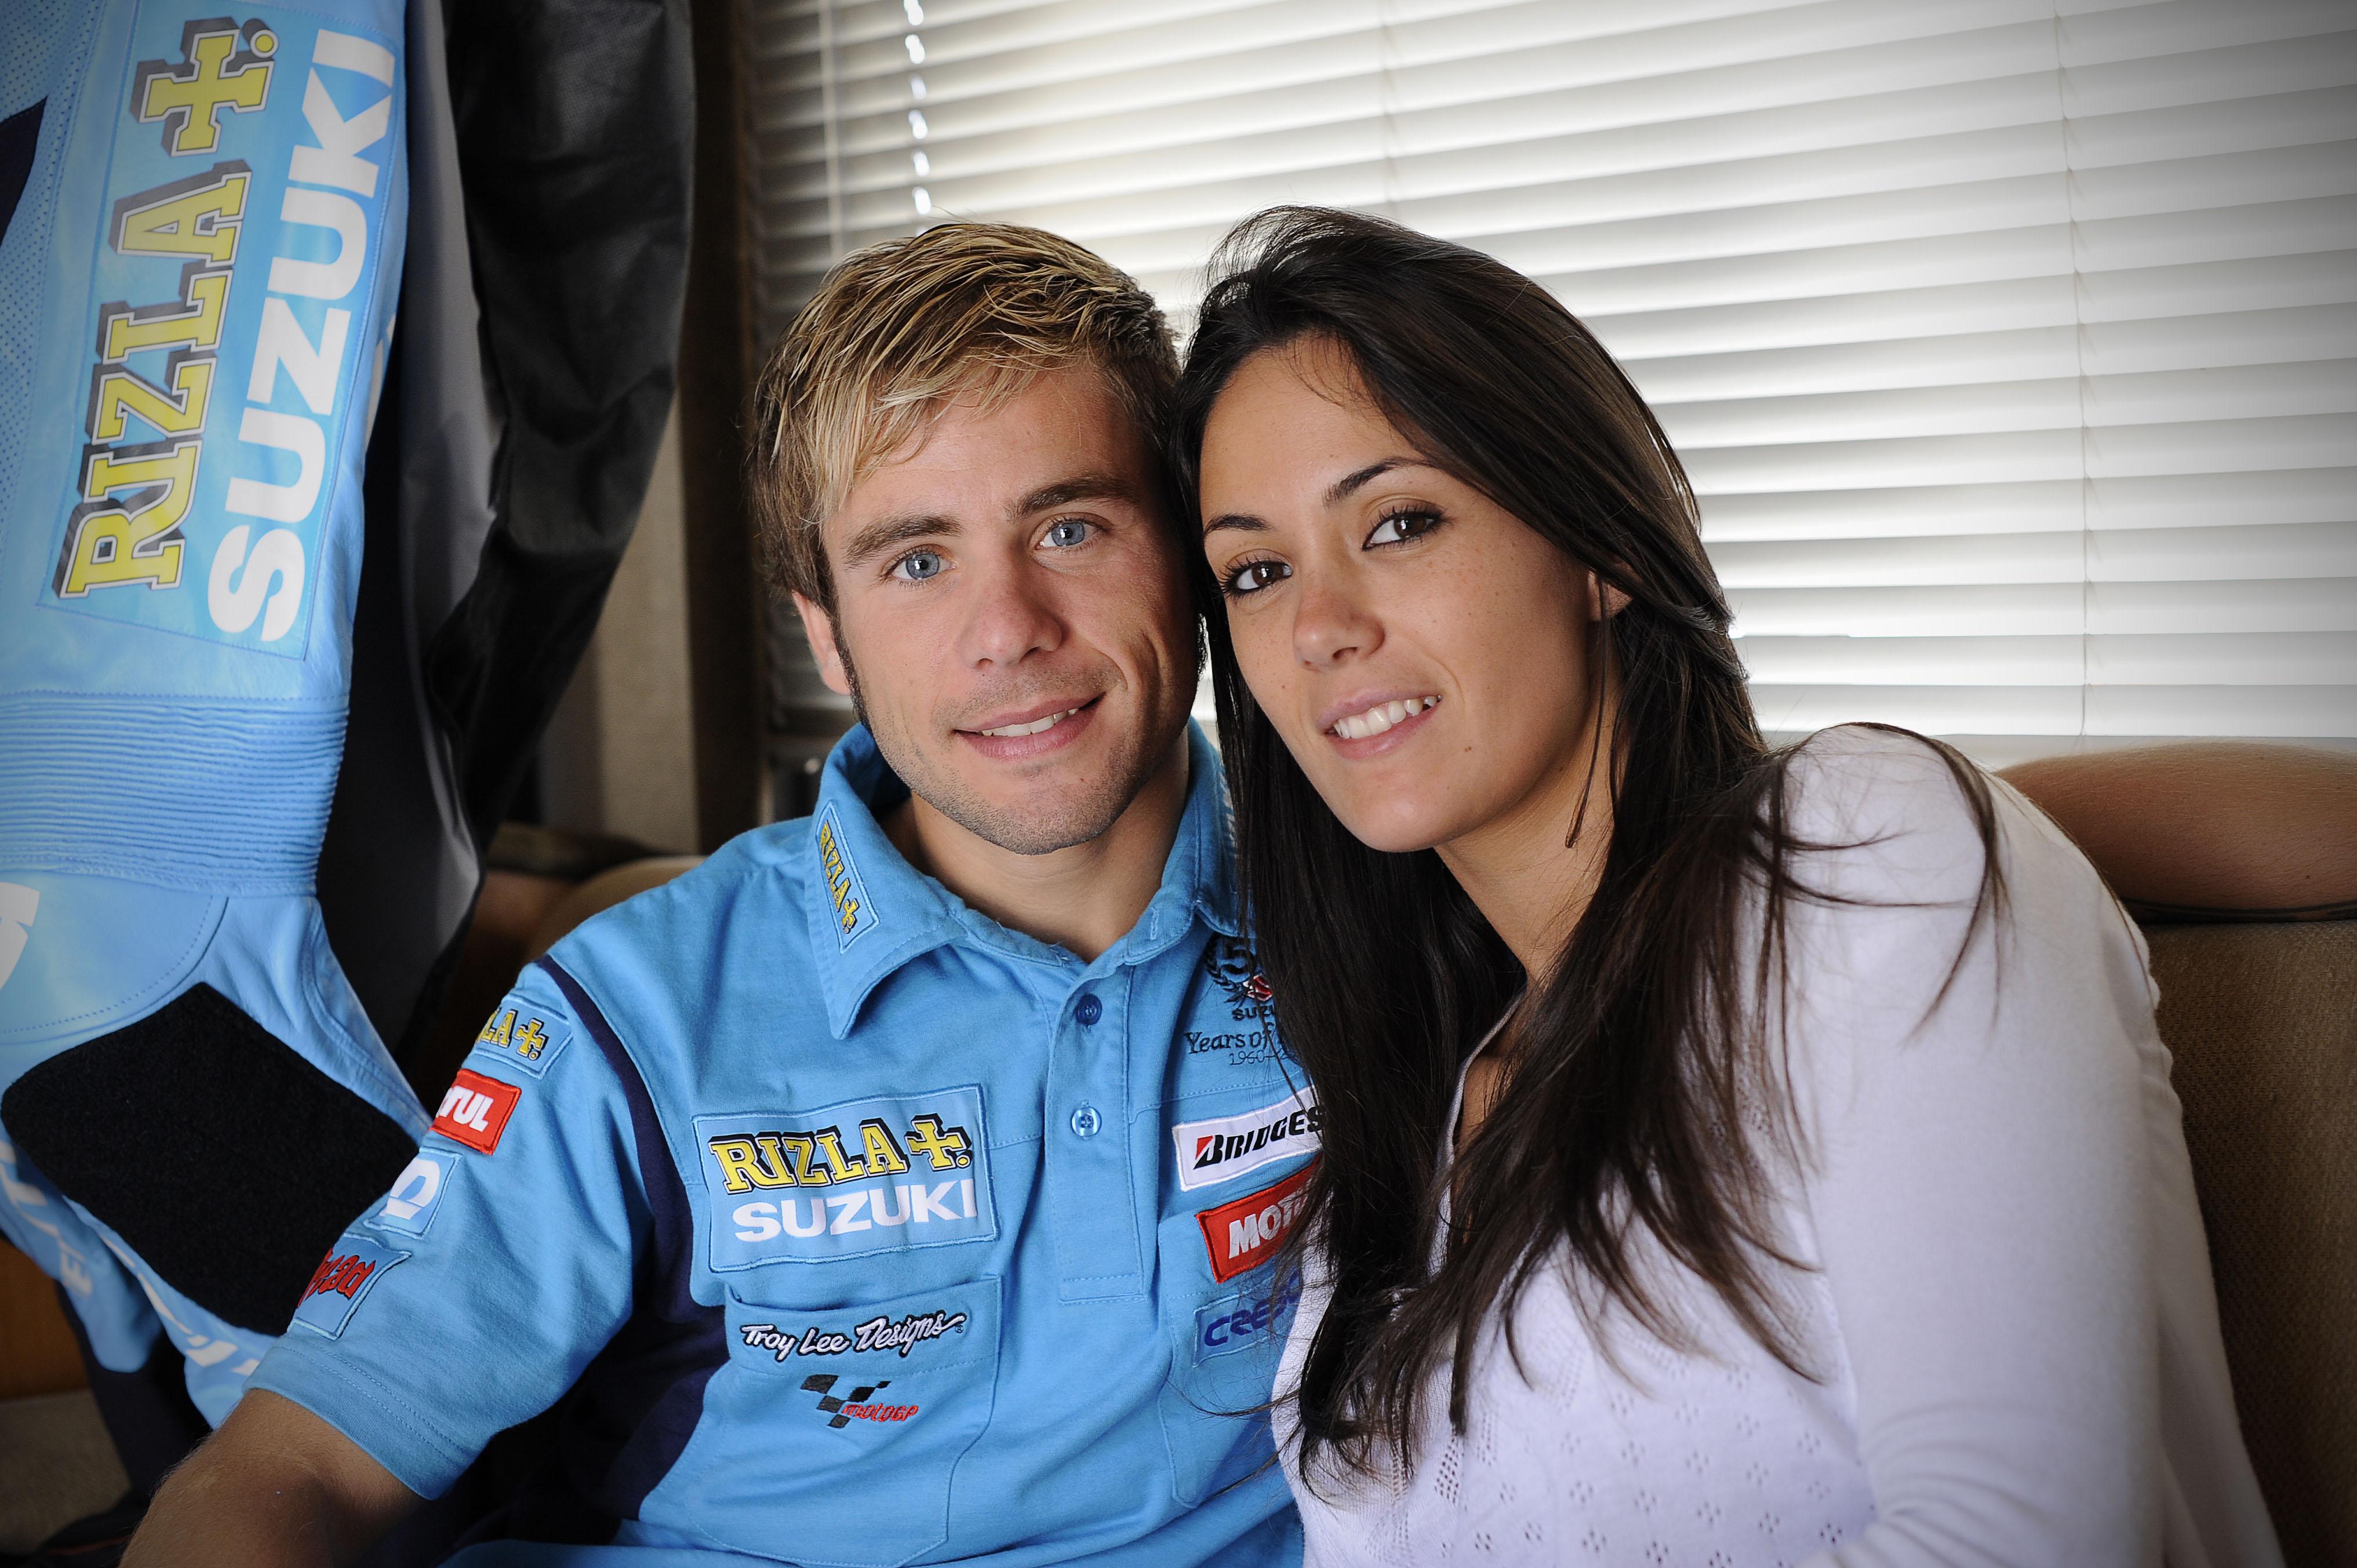 MotoGP: Alvaro Bautista's girlfriend | Visordown